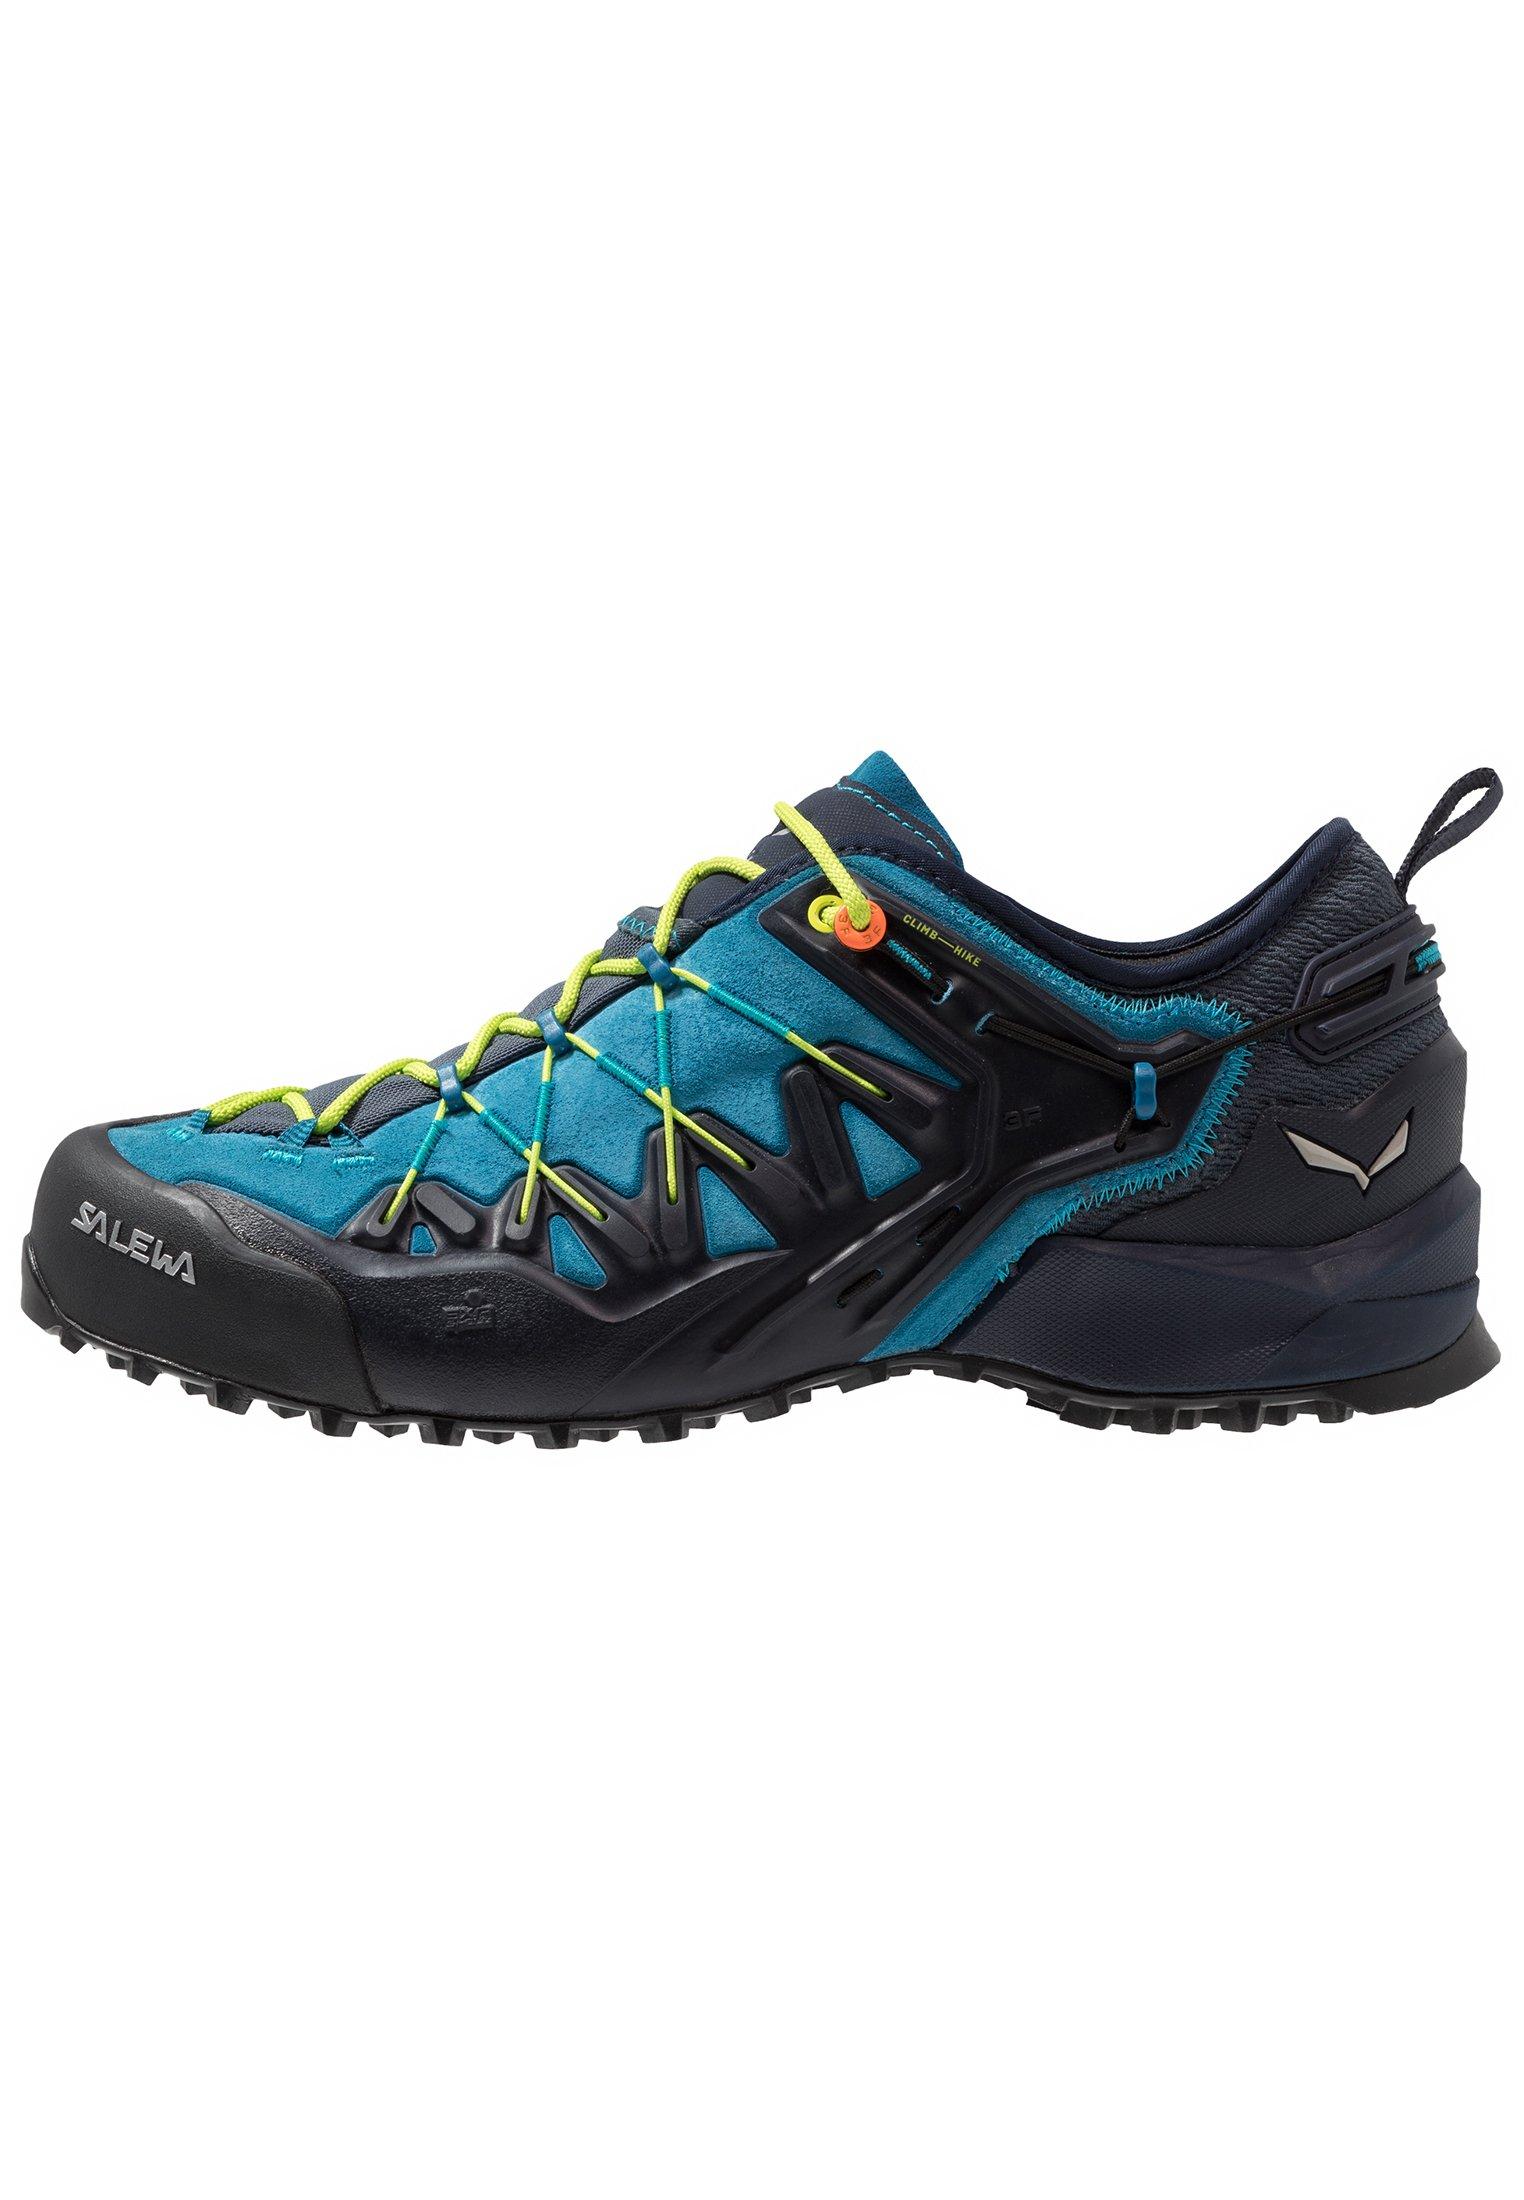 Men MS WILDFIRE EDGE - Climbing shoes